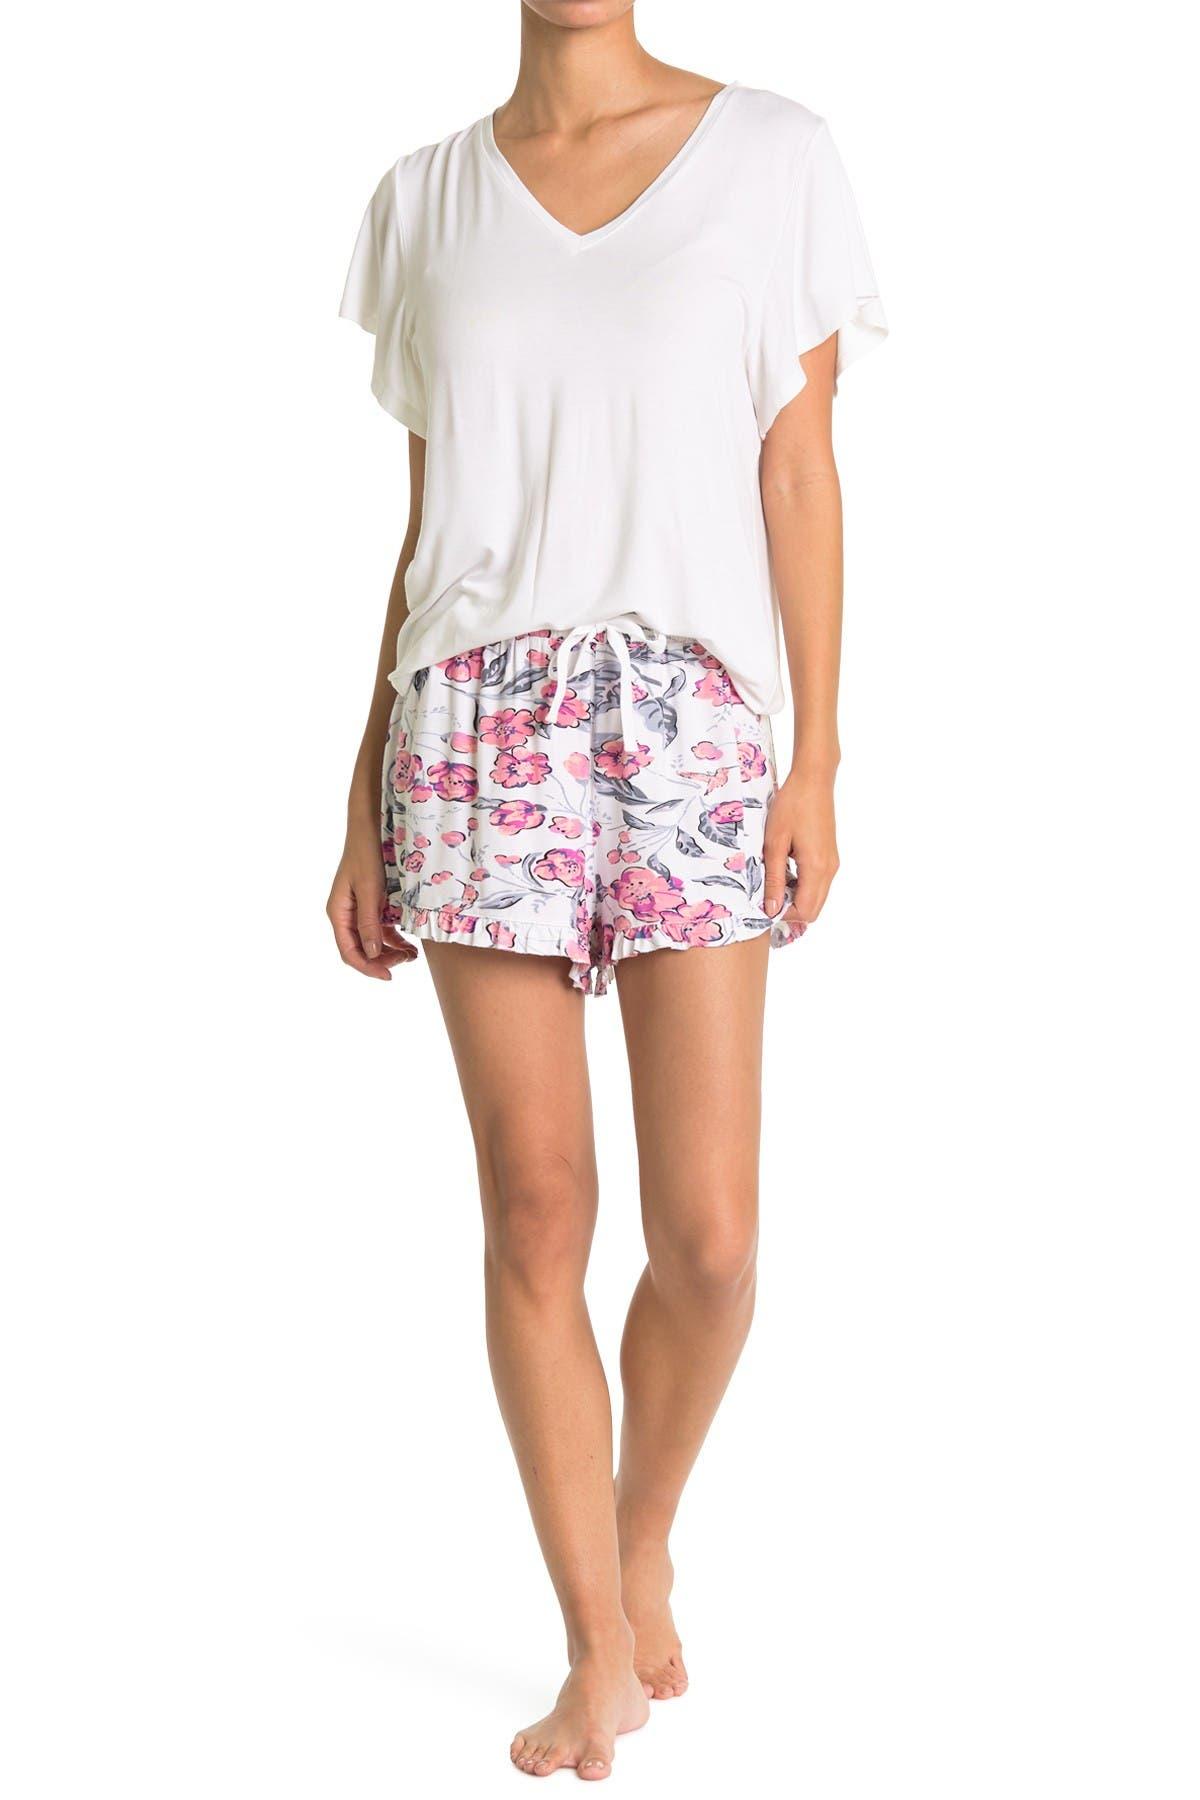 Image of Vera Bradley V-Neck Shirt & Shorts 2-Piece Pajama Set